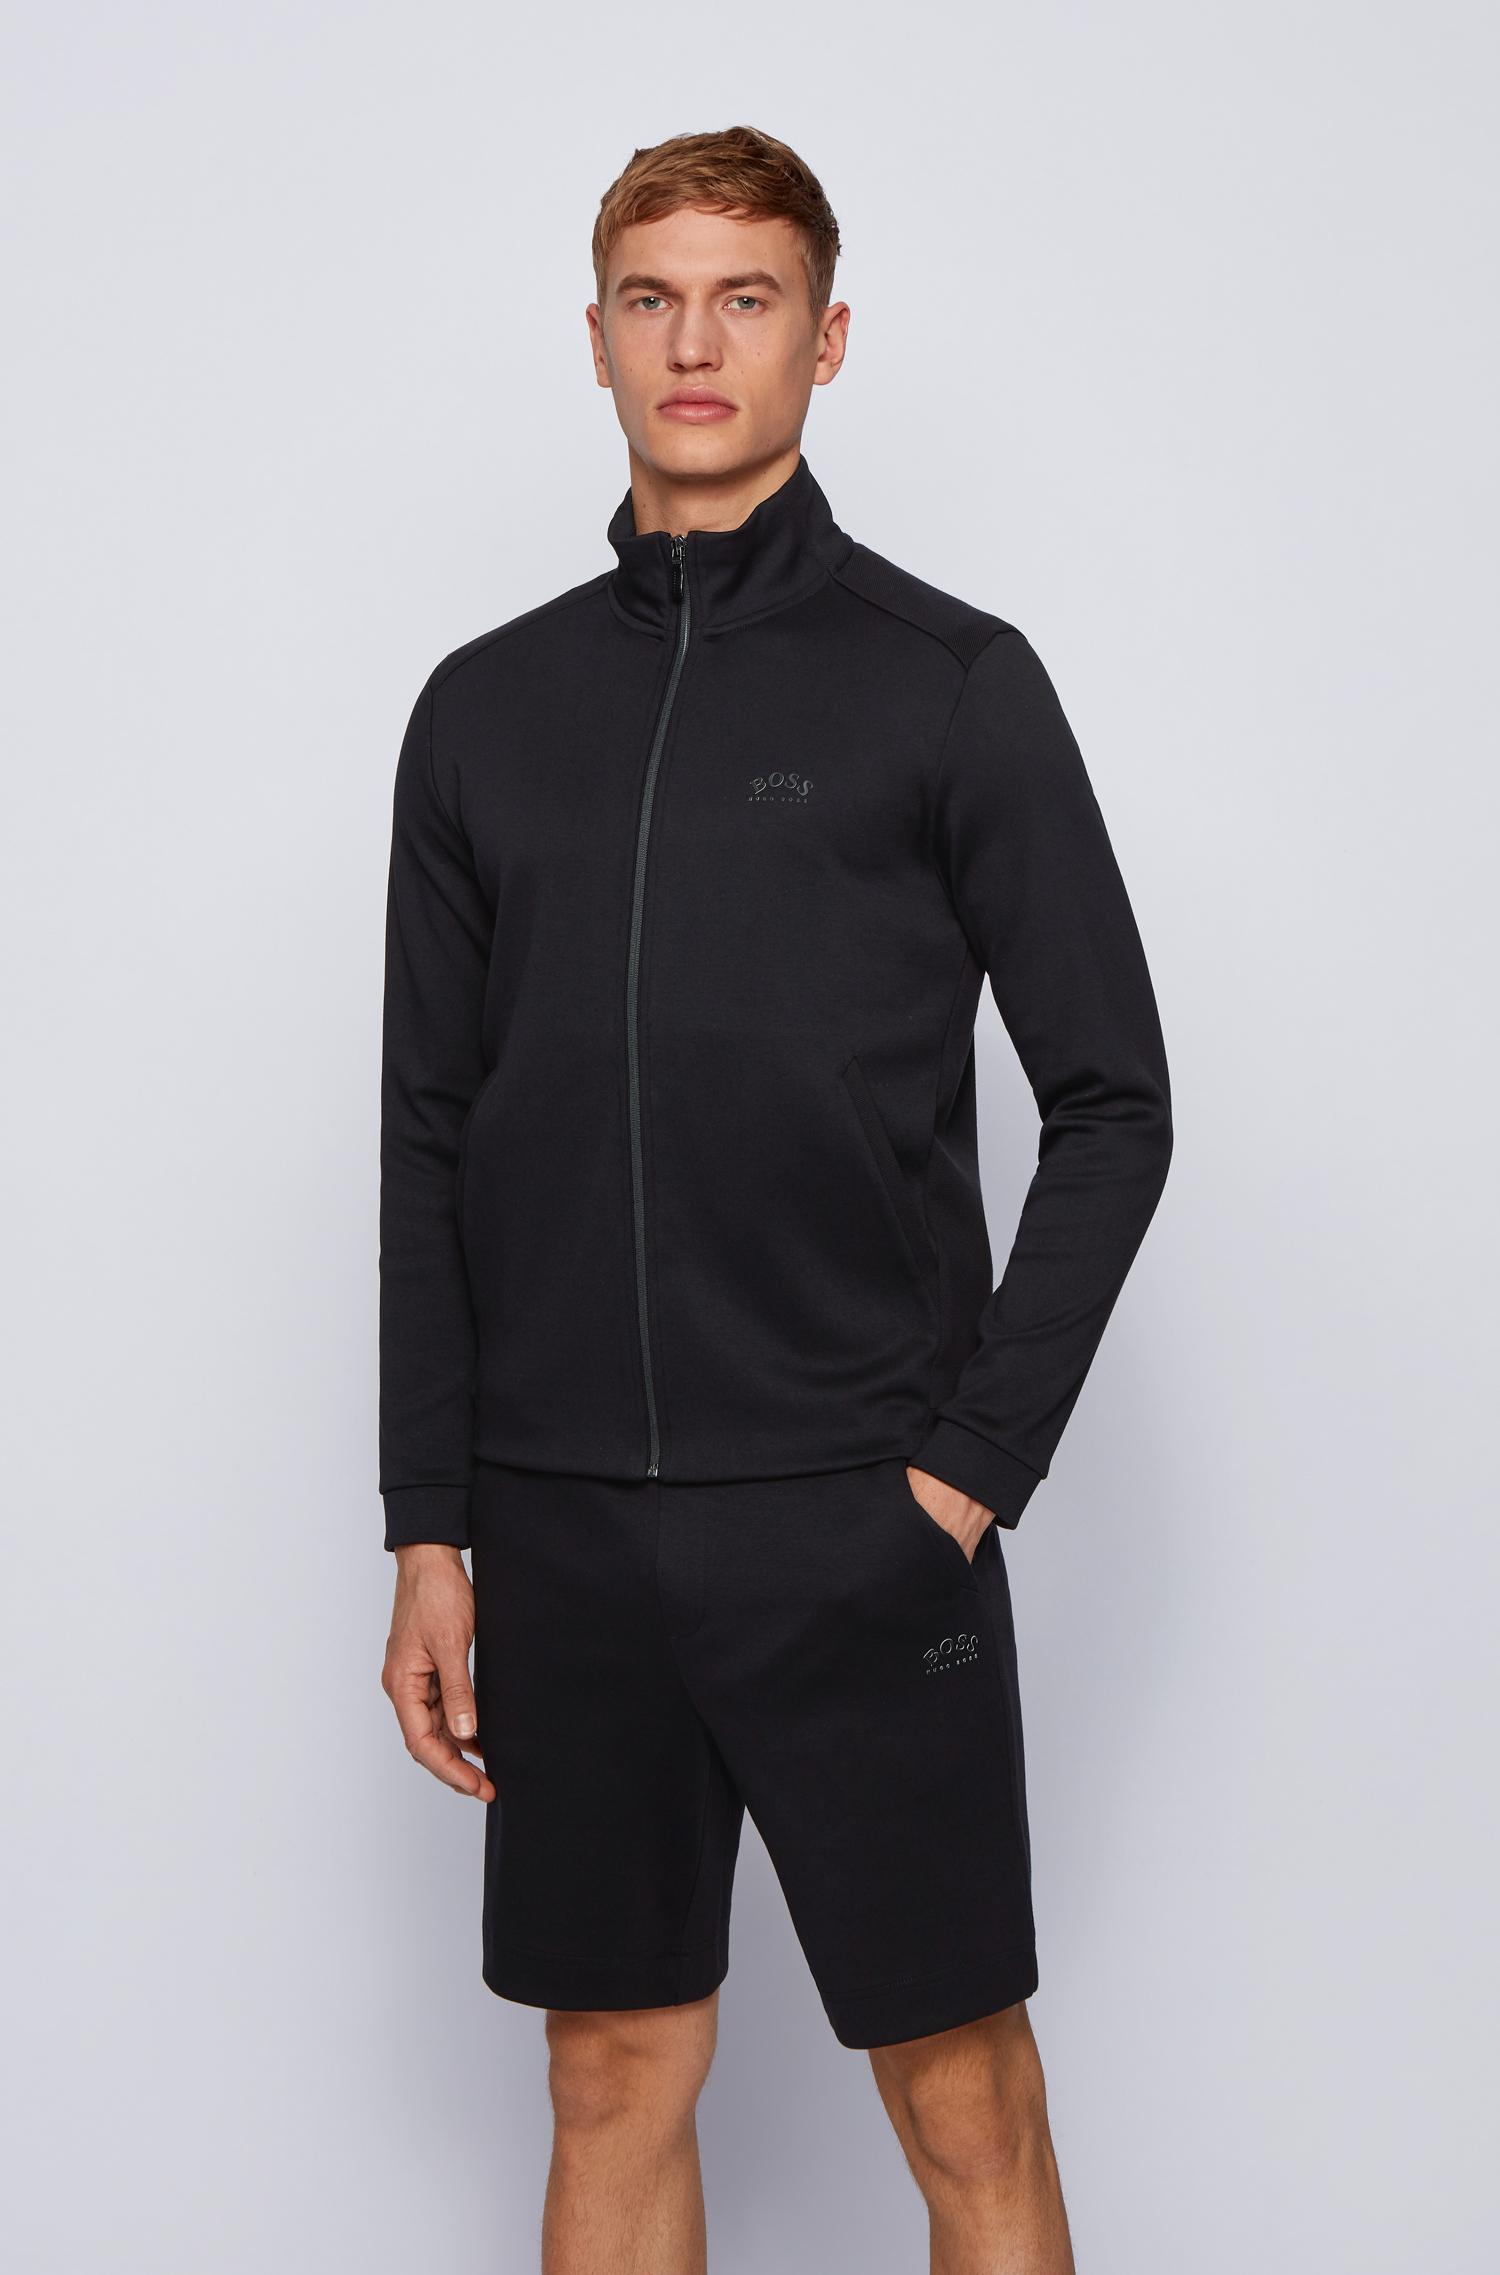 Hugo Boss Zip sweatshirt, black, xxx-large